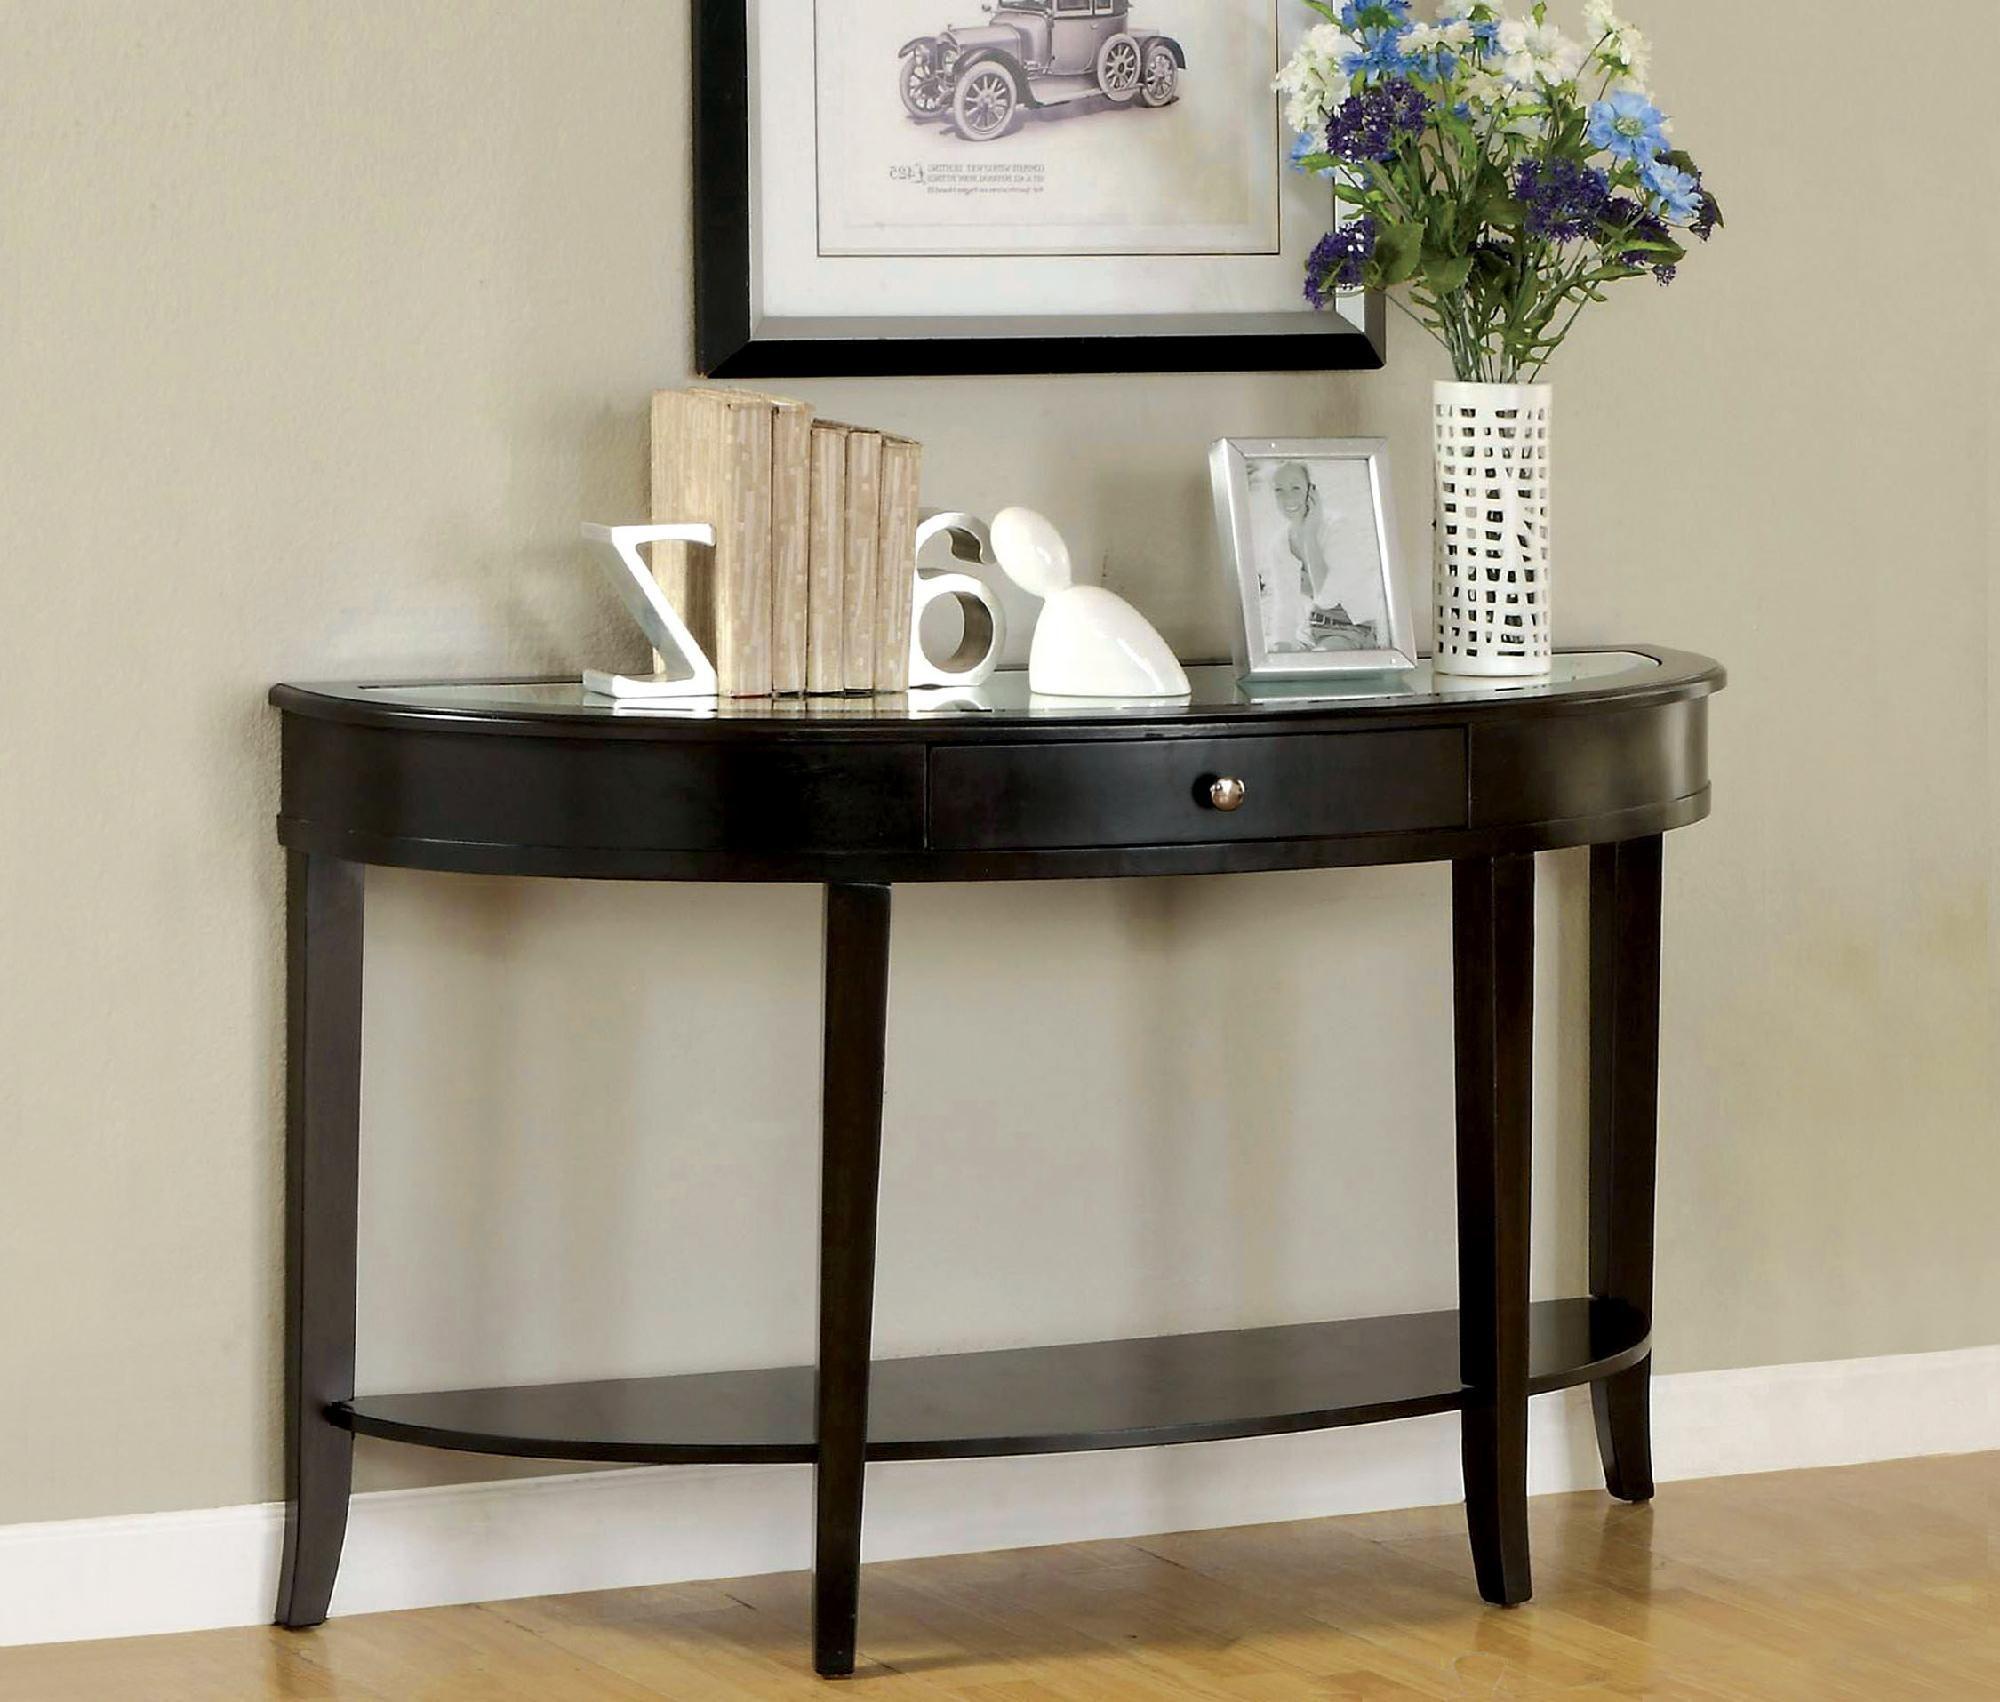 Furniture of America Half Moon Bay Dark Walnut Sofa Table with Drawer  Brown. Furniture of America Half Moon Bay Dark Walnut Sofa Table with